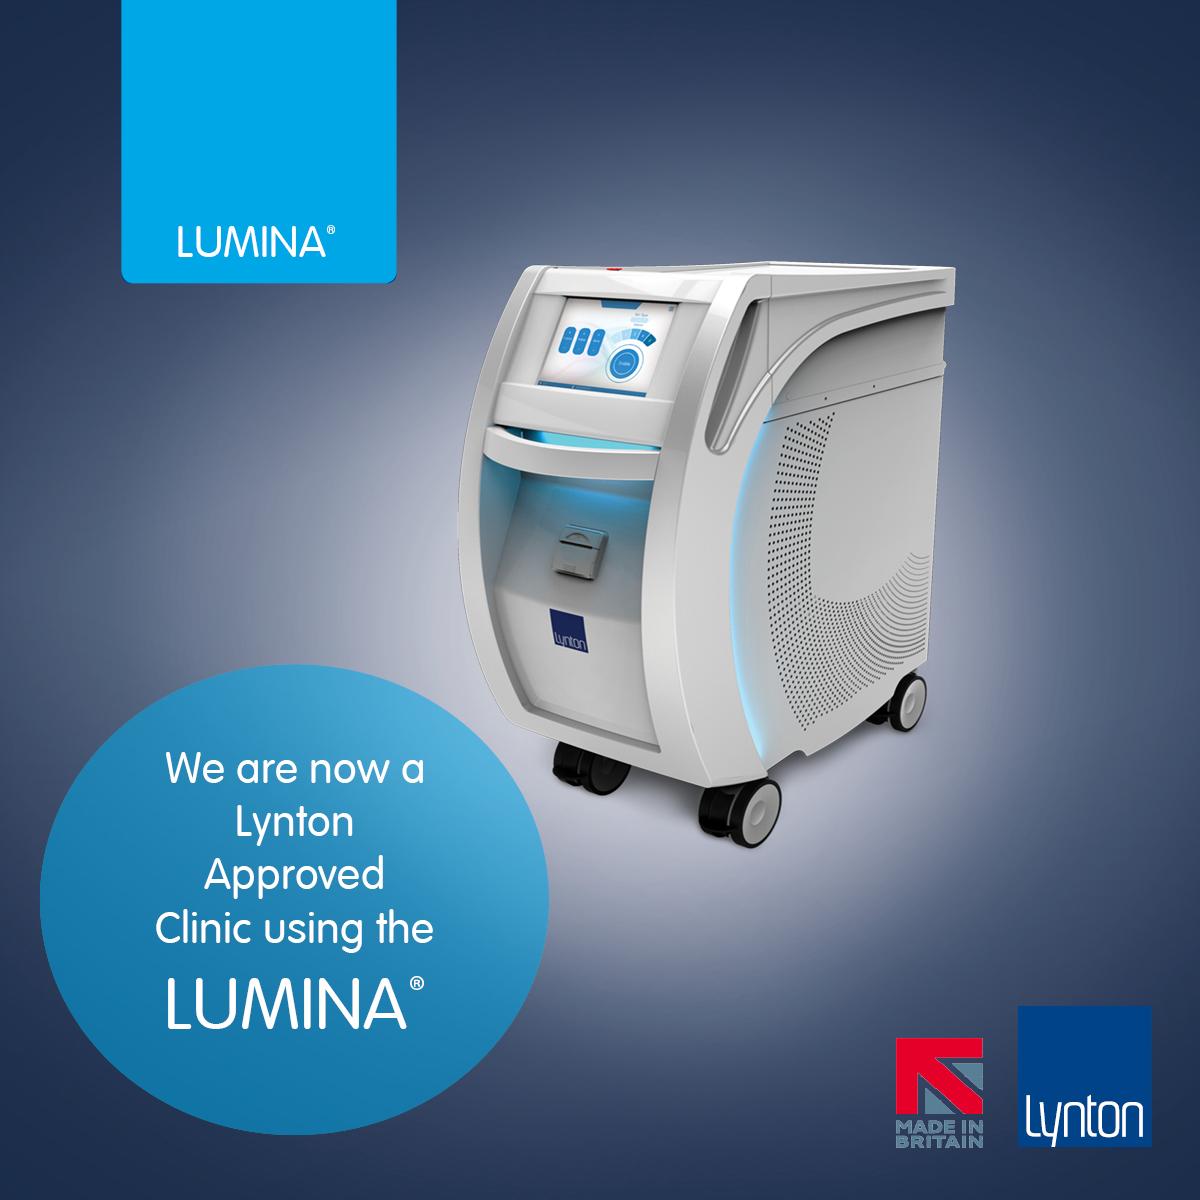 Lynton lumina ipl machine promotional picture